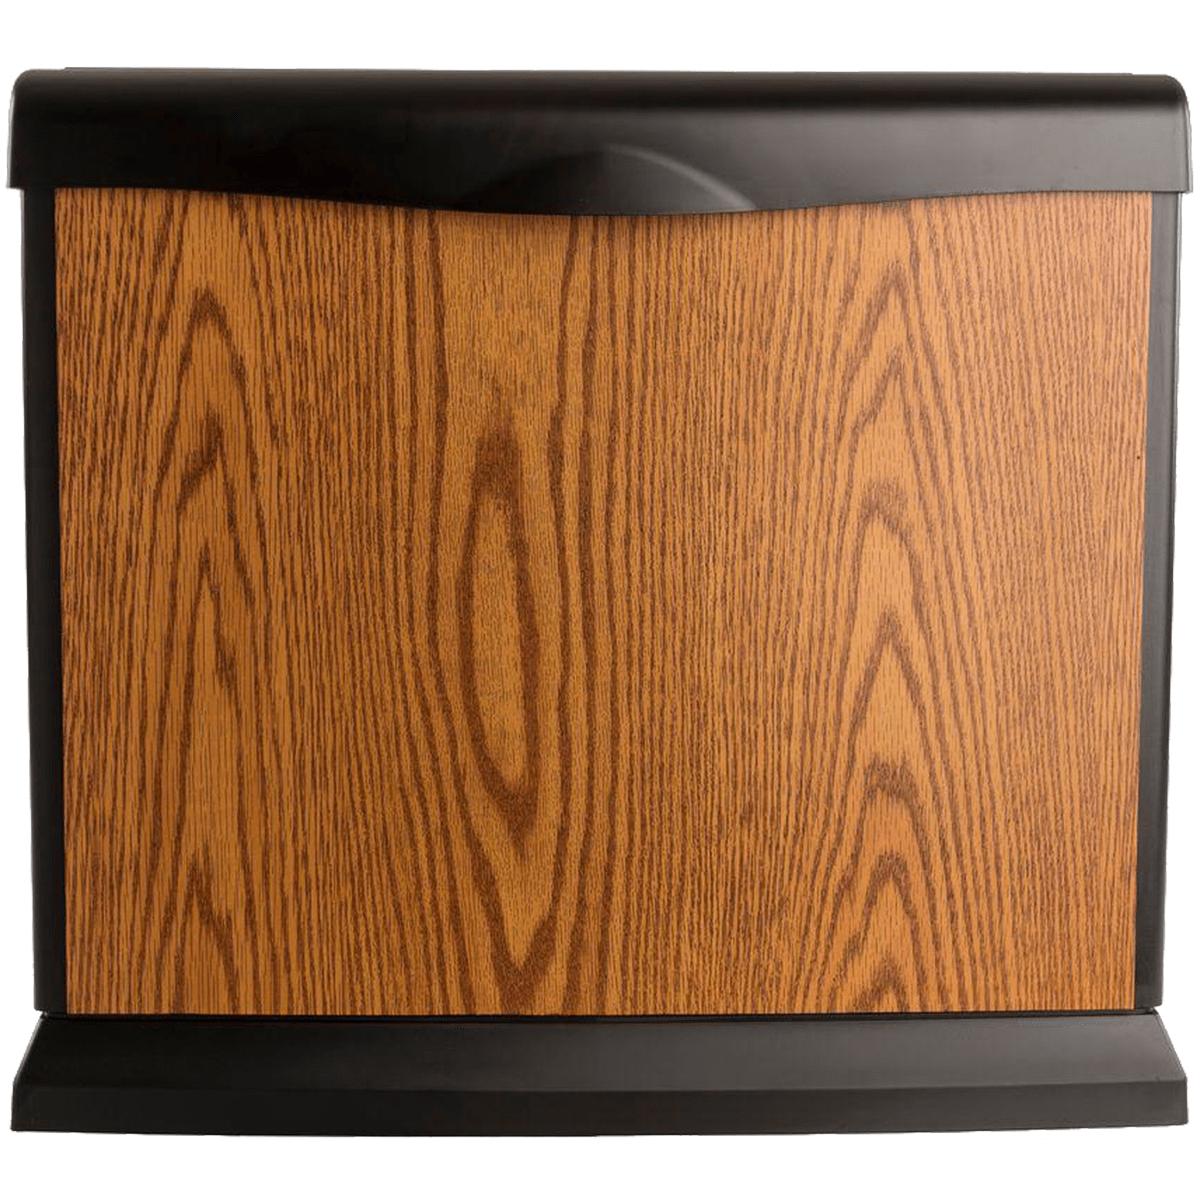 Image of Aircare Valiant 5-gallon Whole House Console Humidifier -- Oak